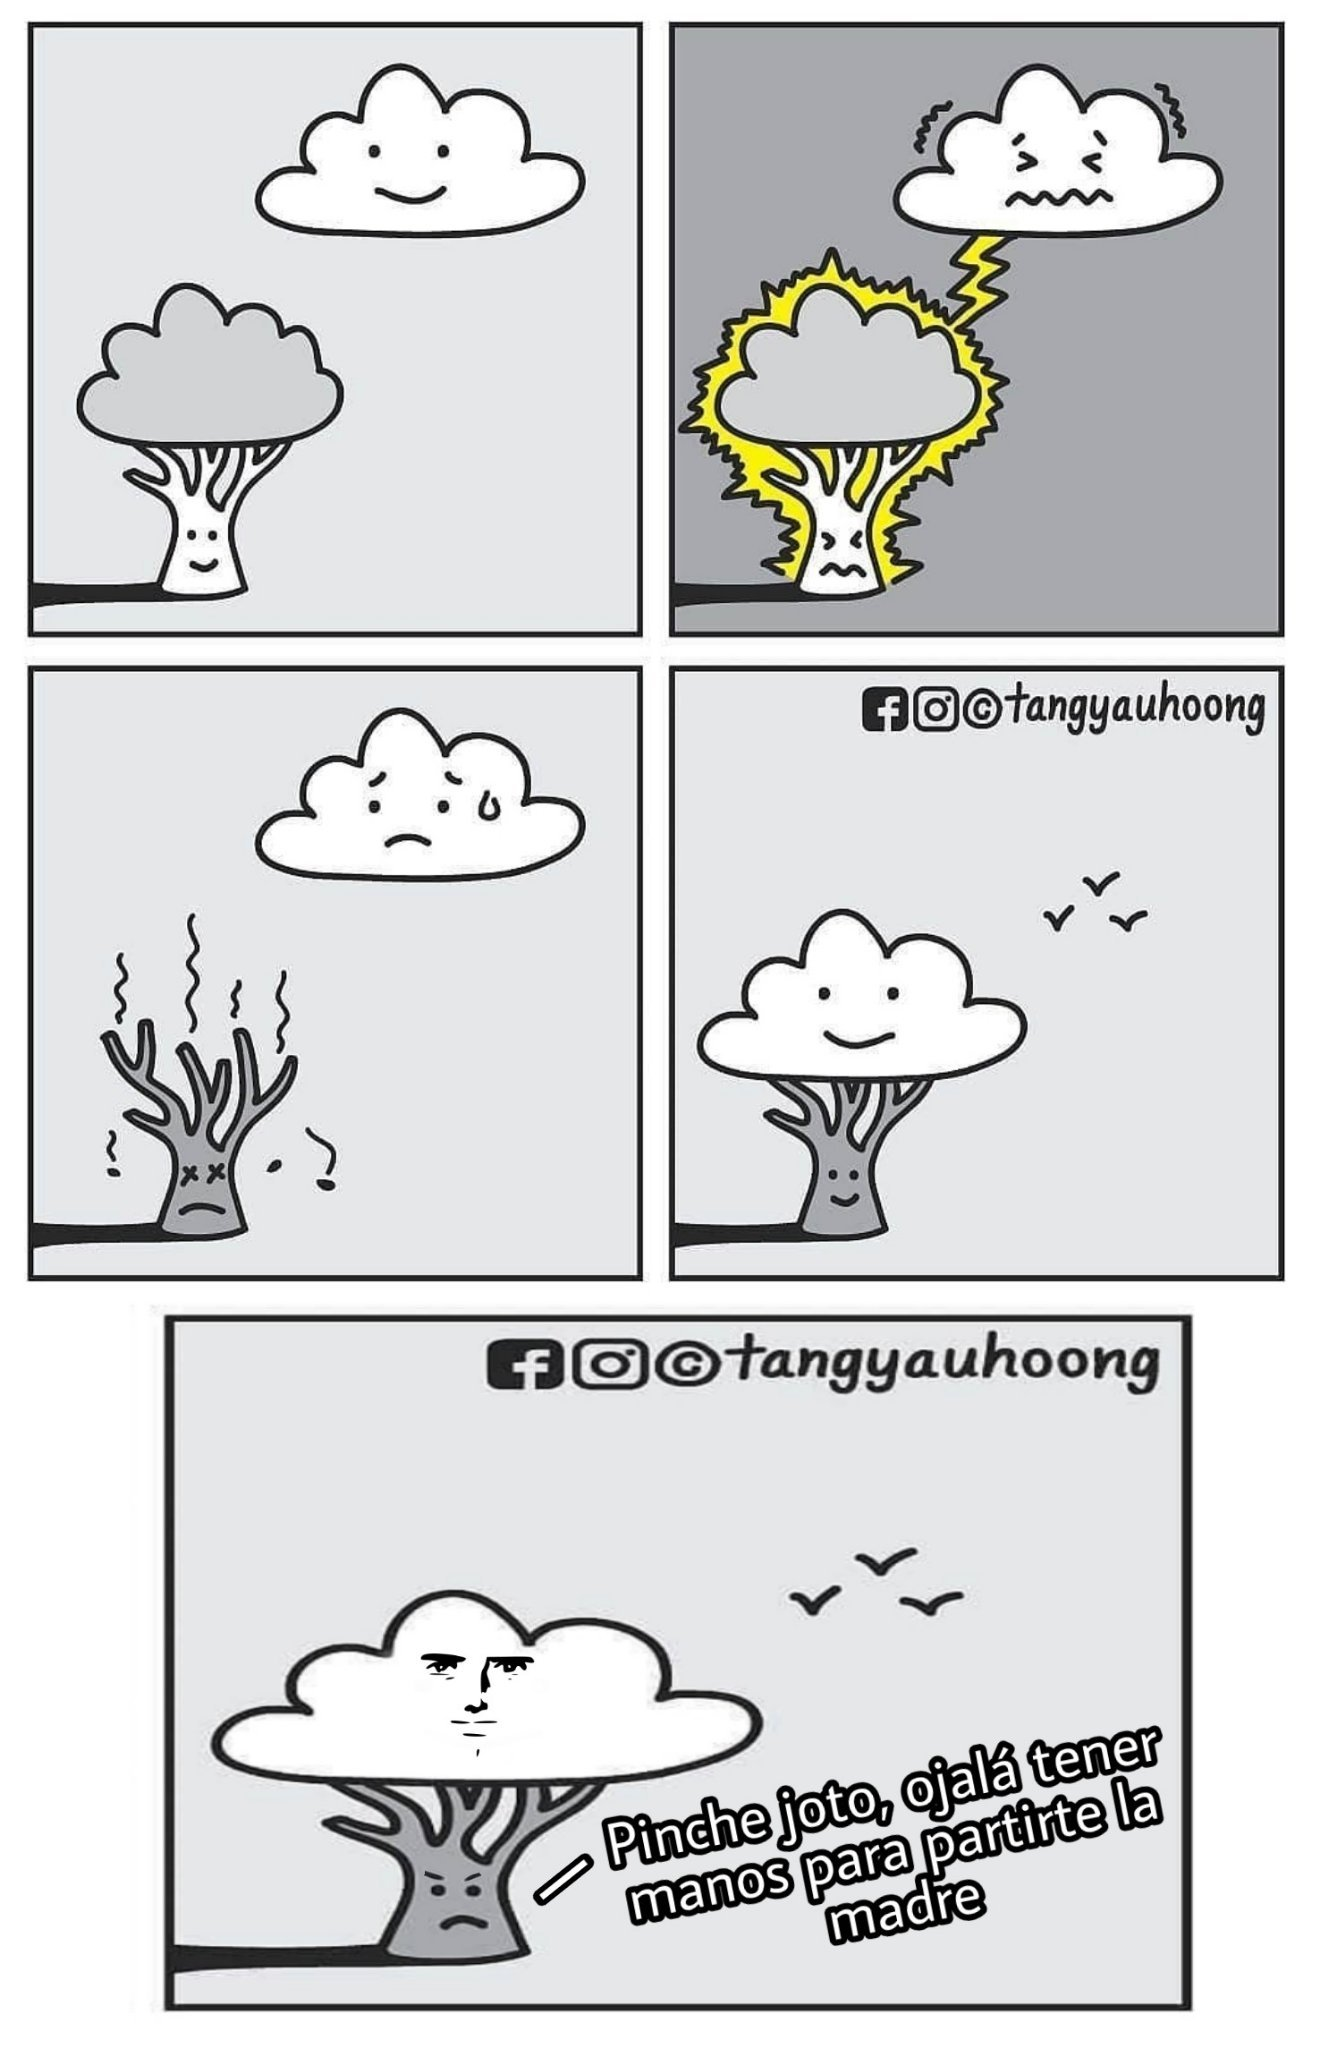 Nube gonza nube gonza - meme